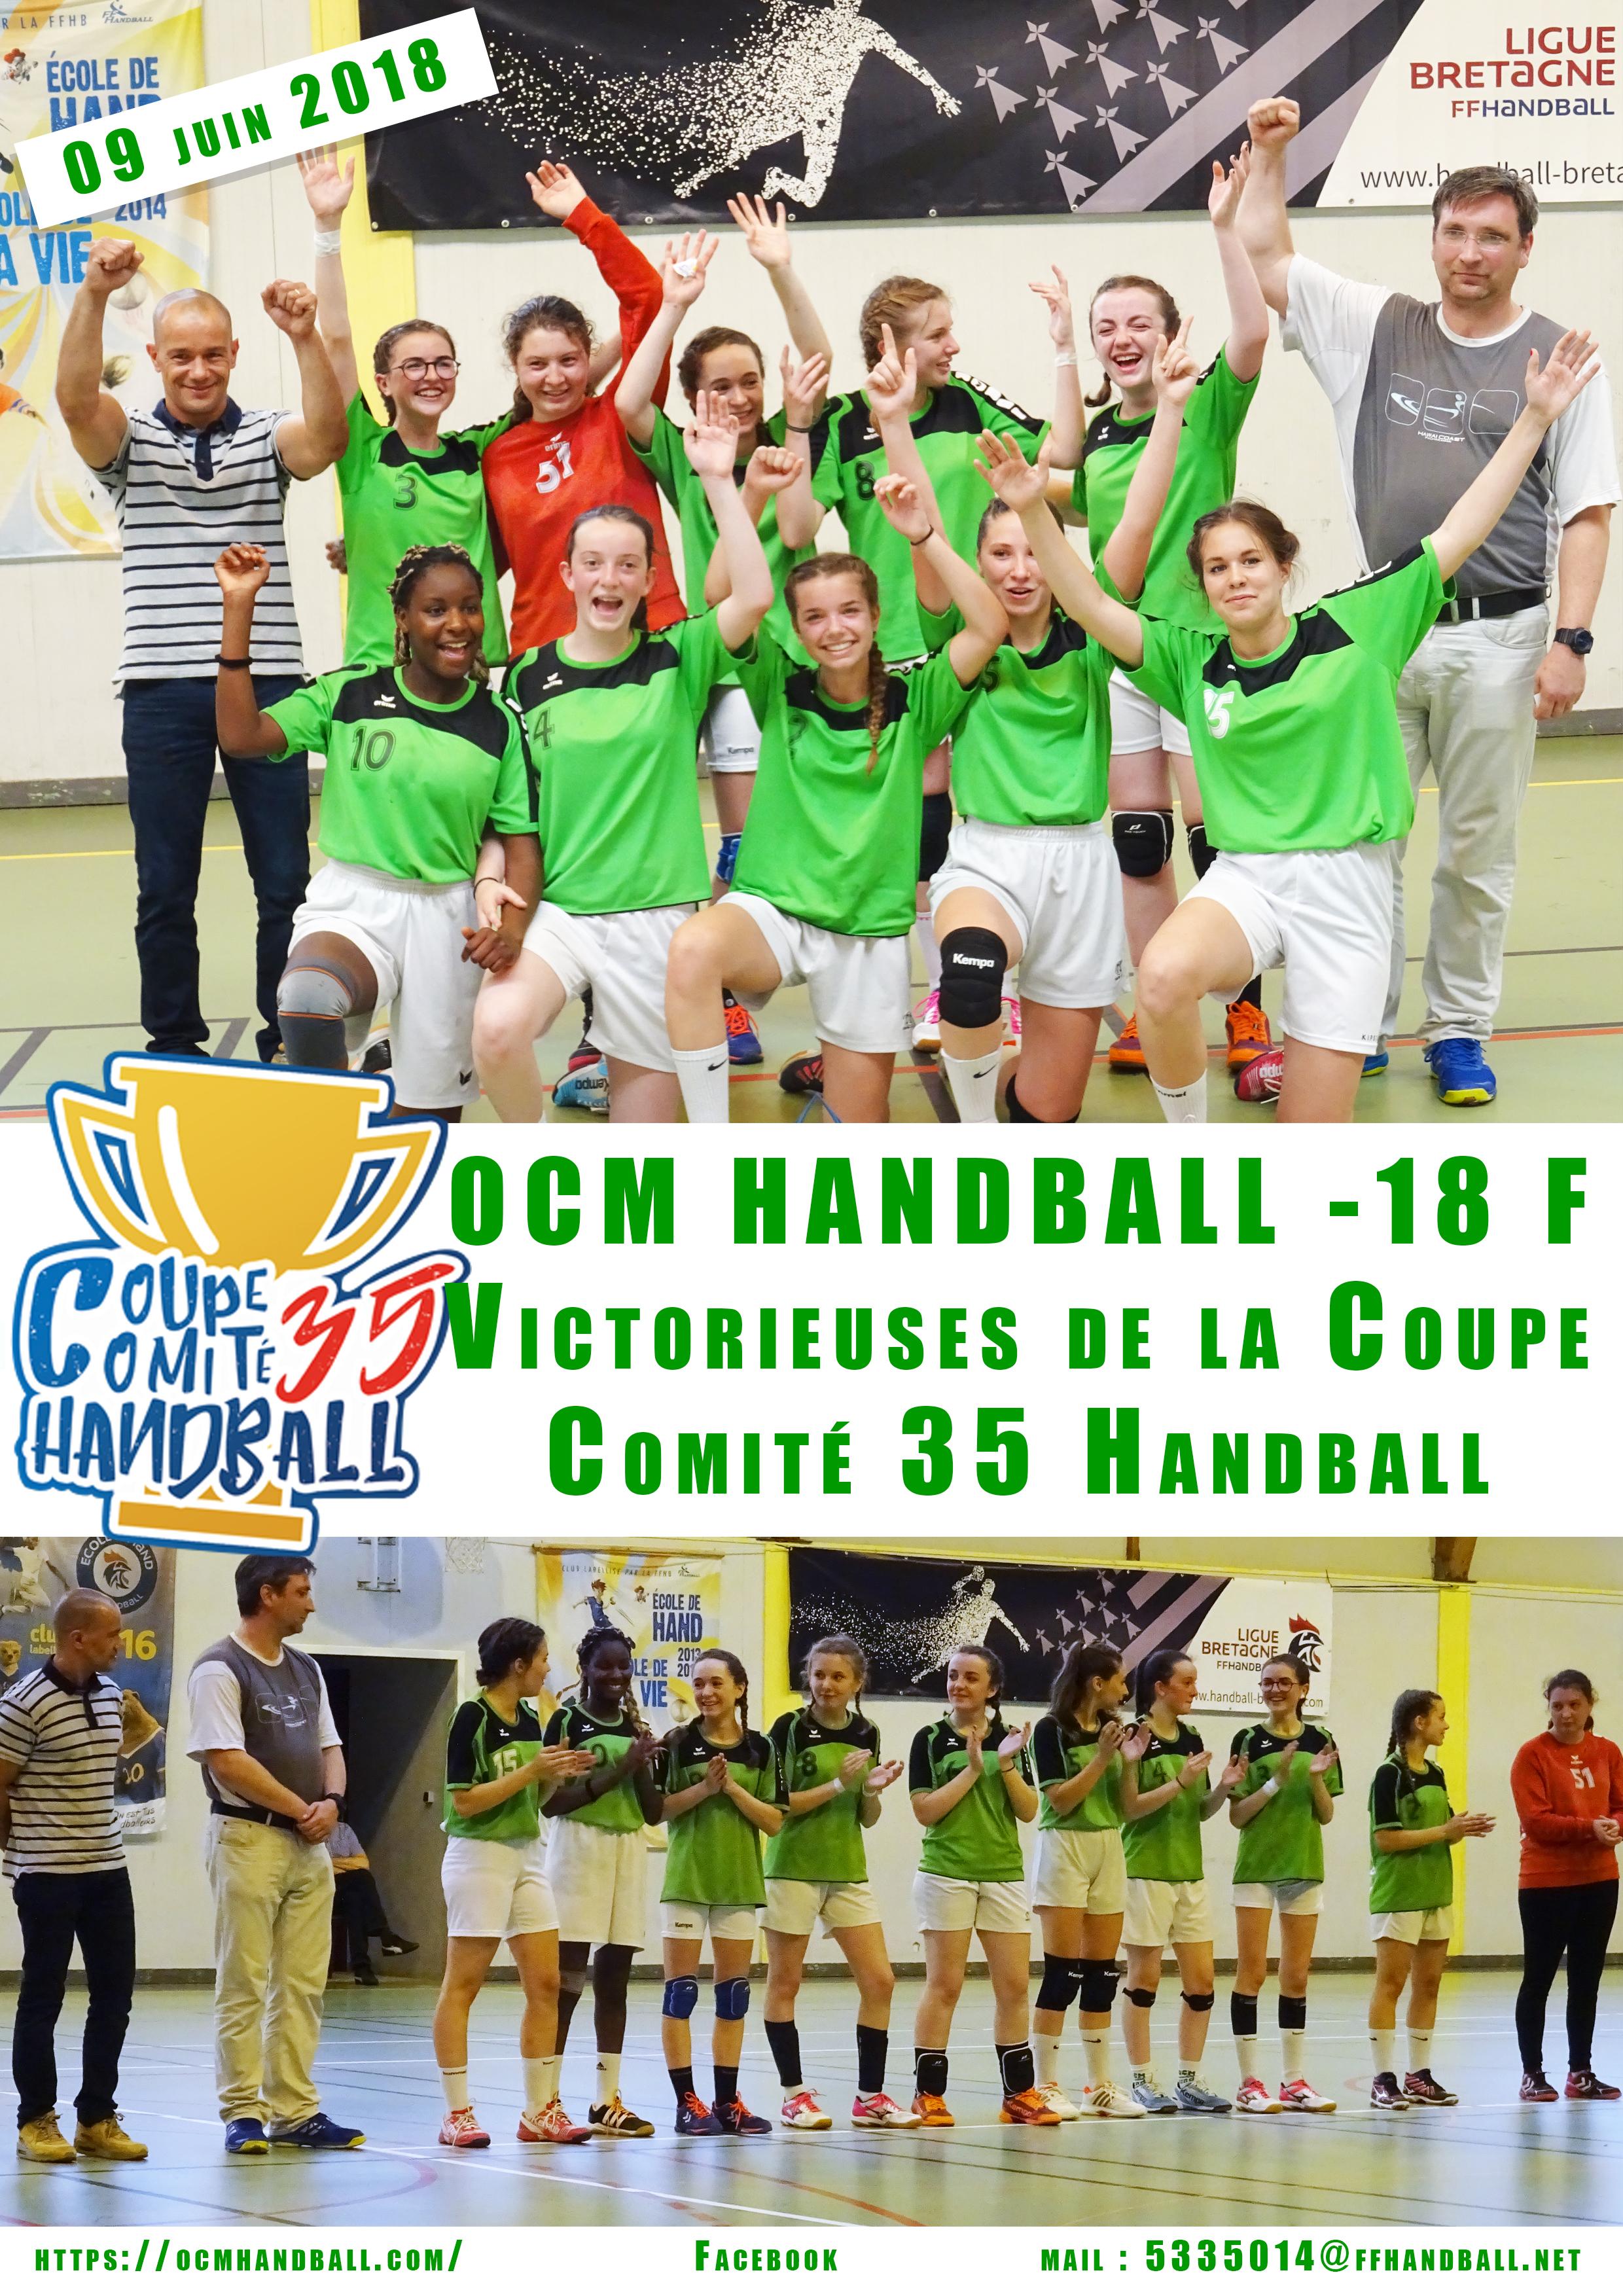 -18f_victorieuses_Coupe_Comité35_Handball